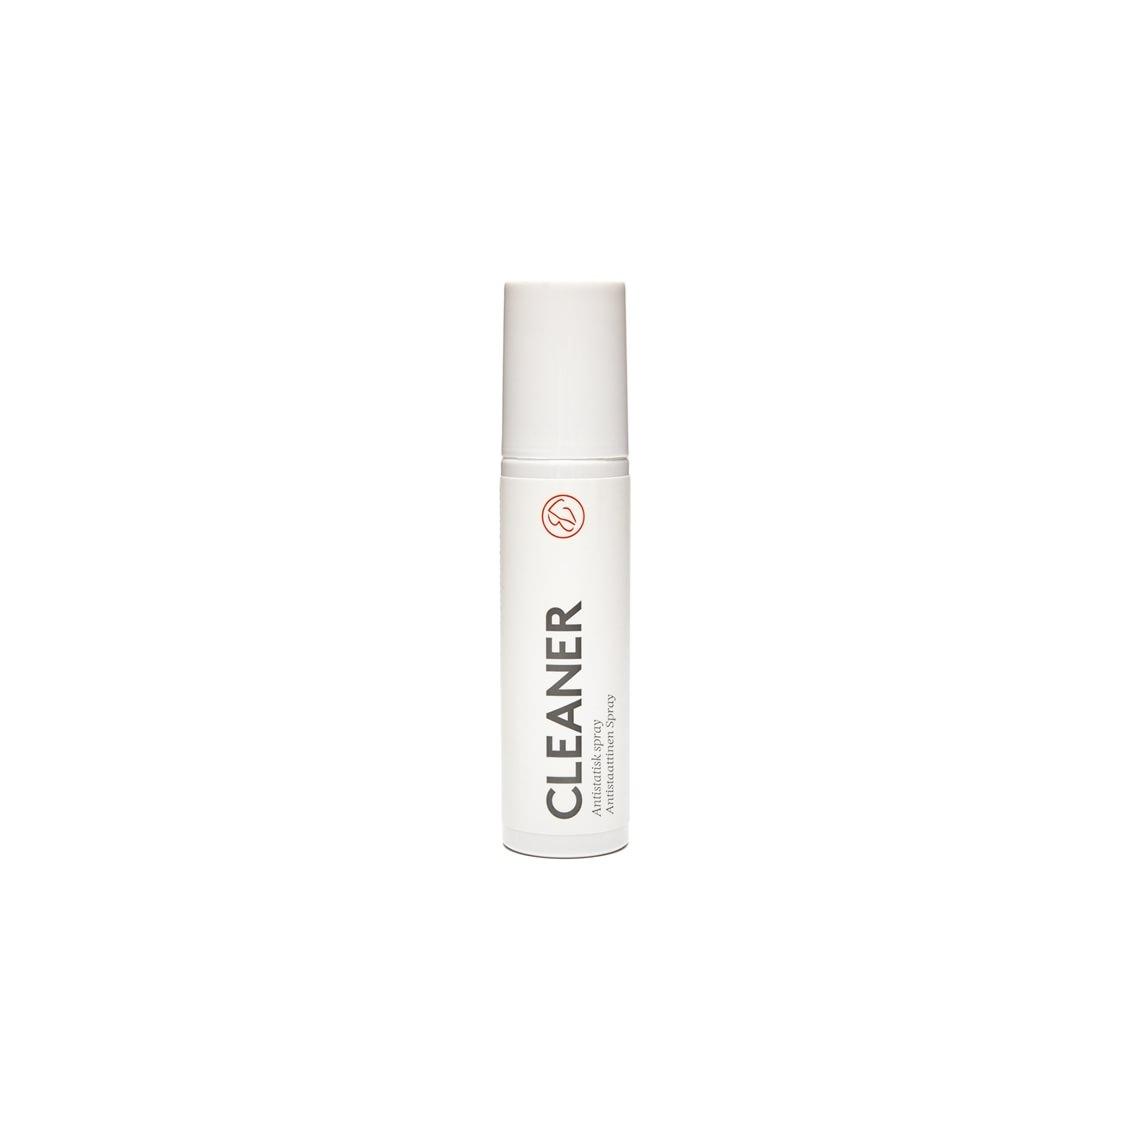 Cleaner rengöringsspray 100 ml